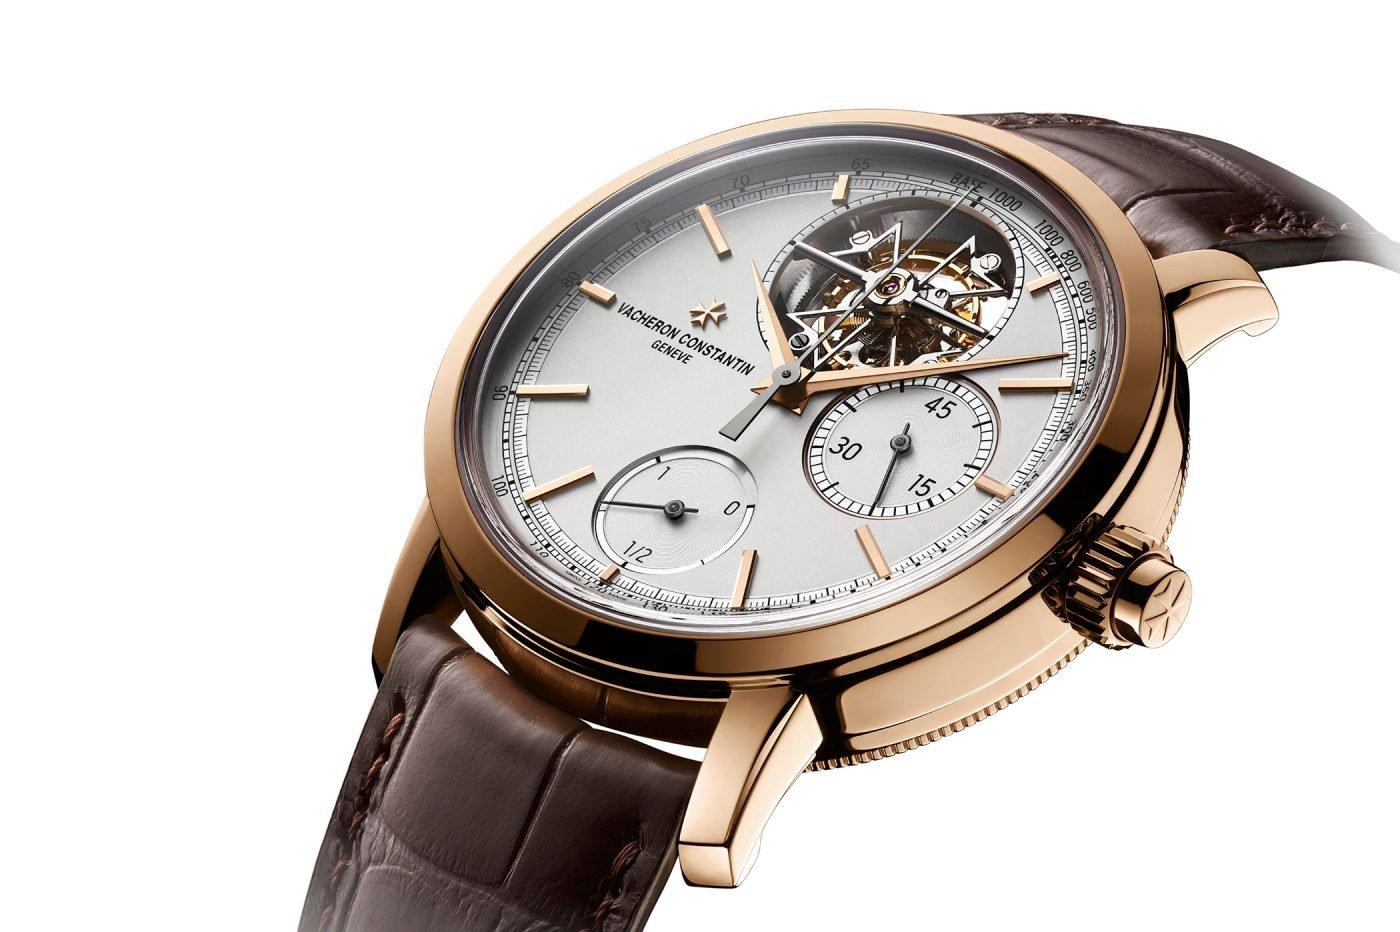 Vacheron Constantin Traditionnelle Tourbillon Chronograph – W&W 2020 [dostępność, cena]